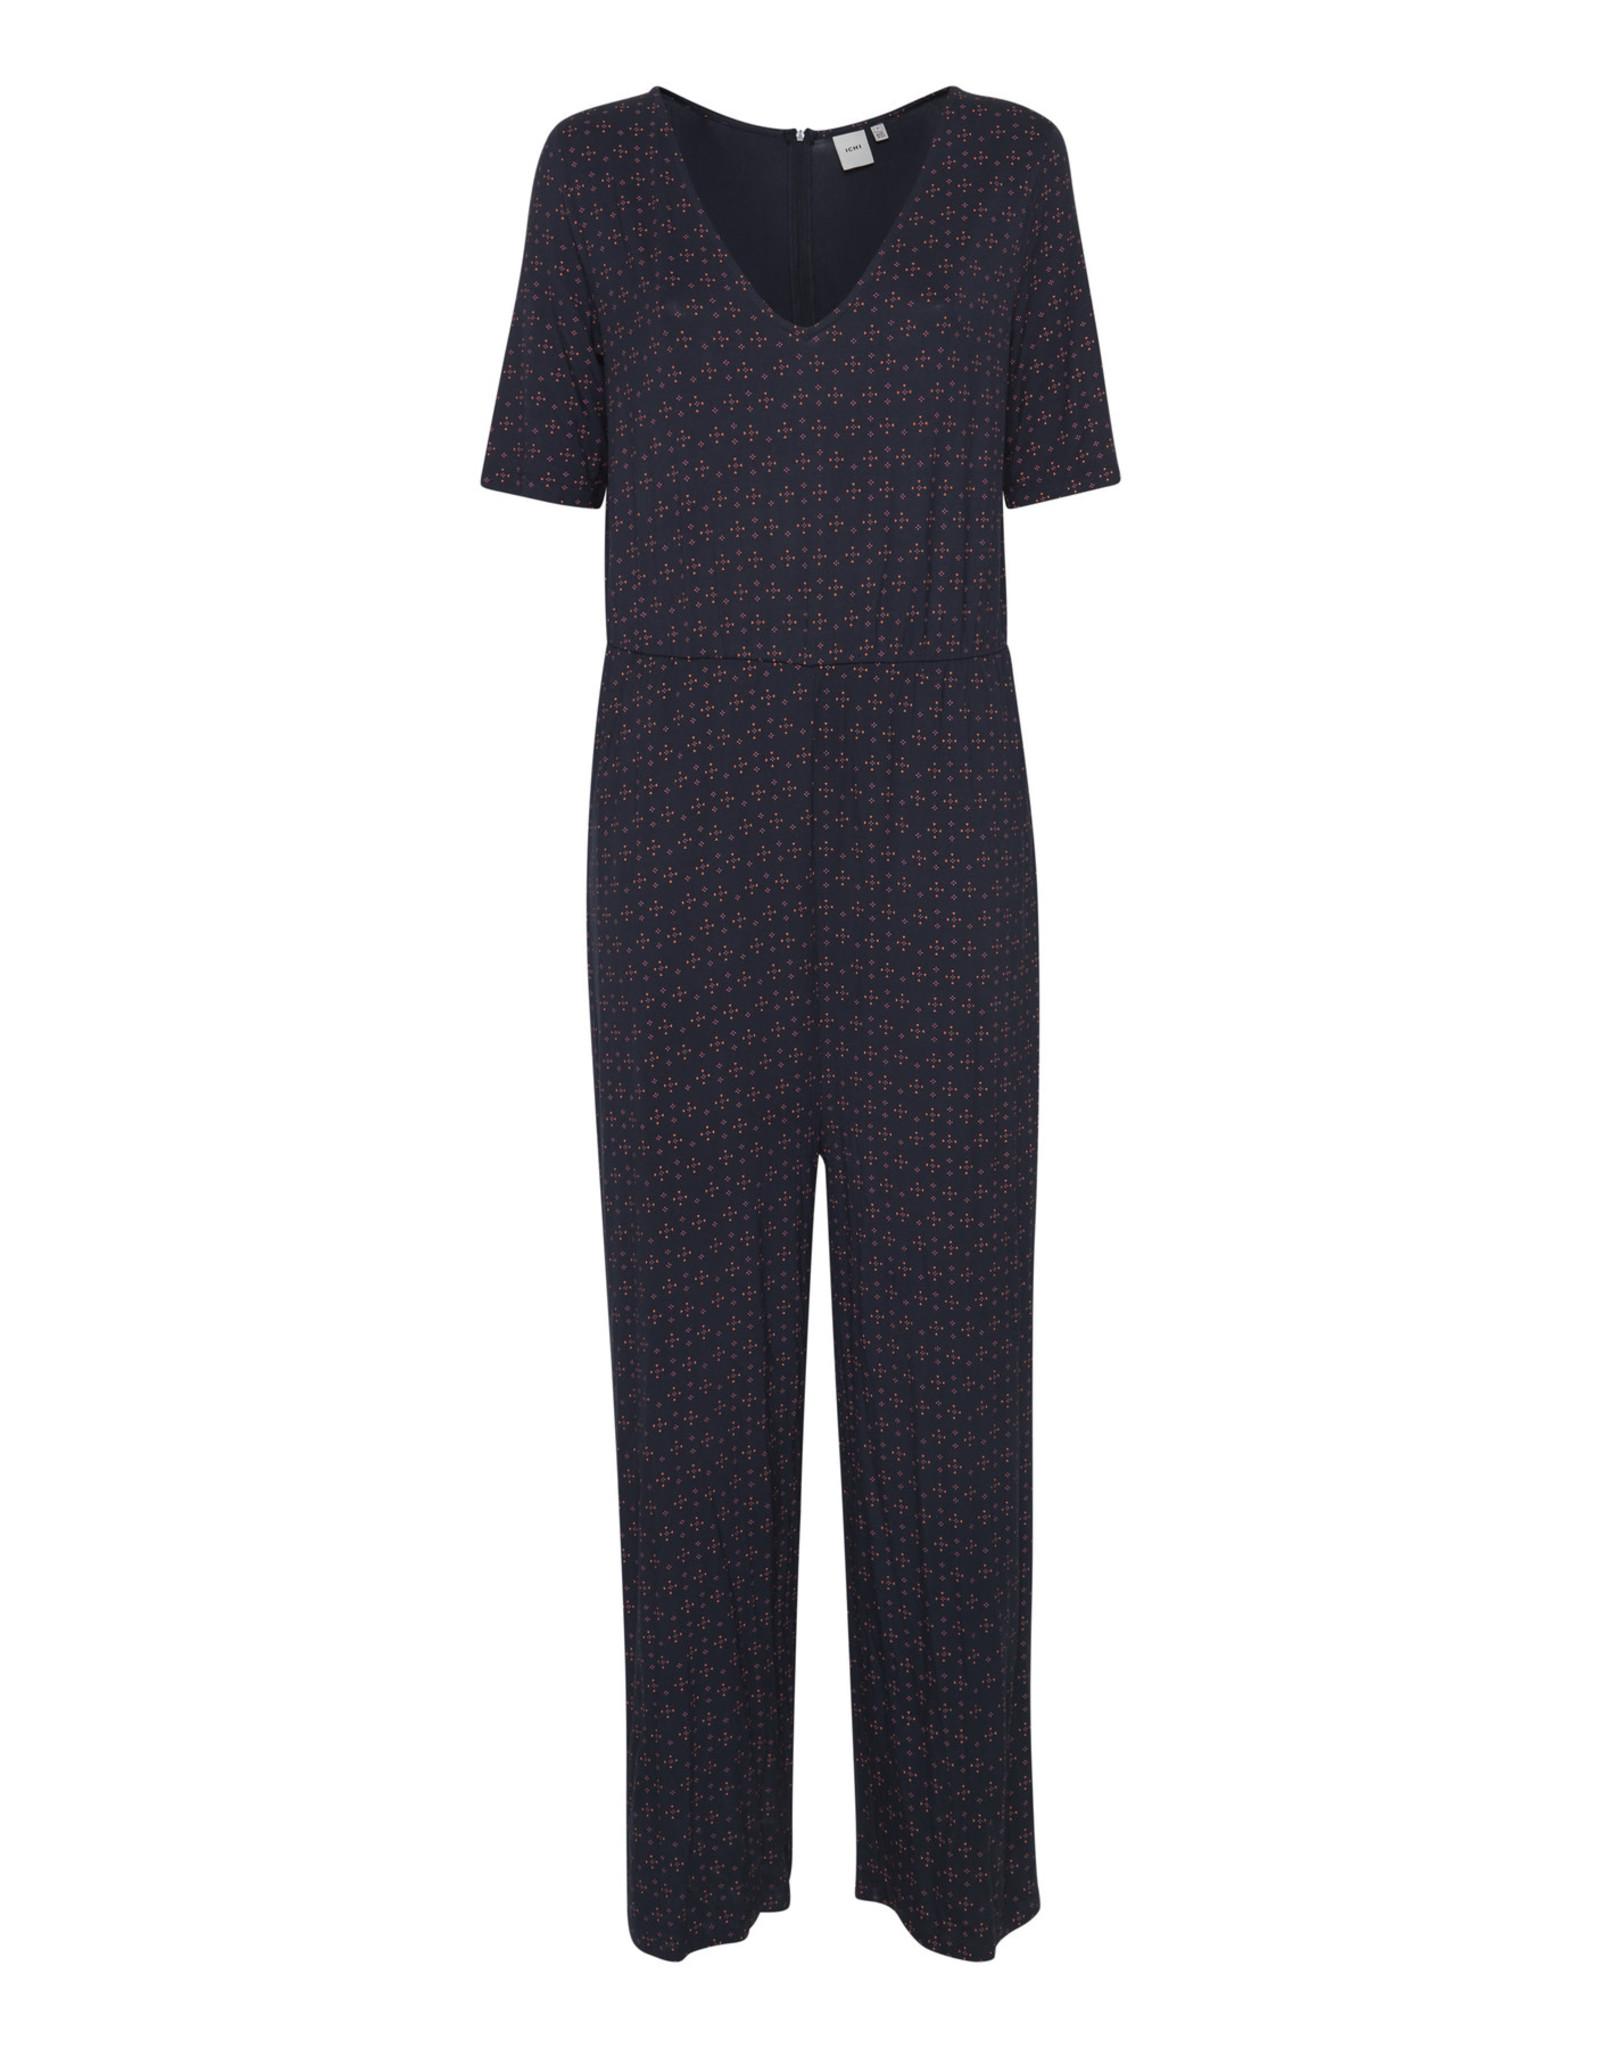 IDK - Short Sleeve Jumpsuit